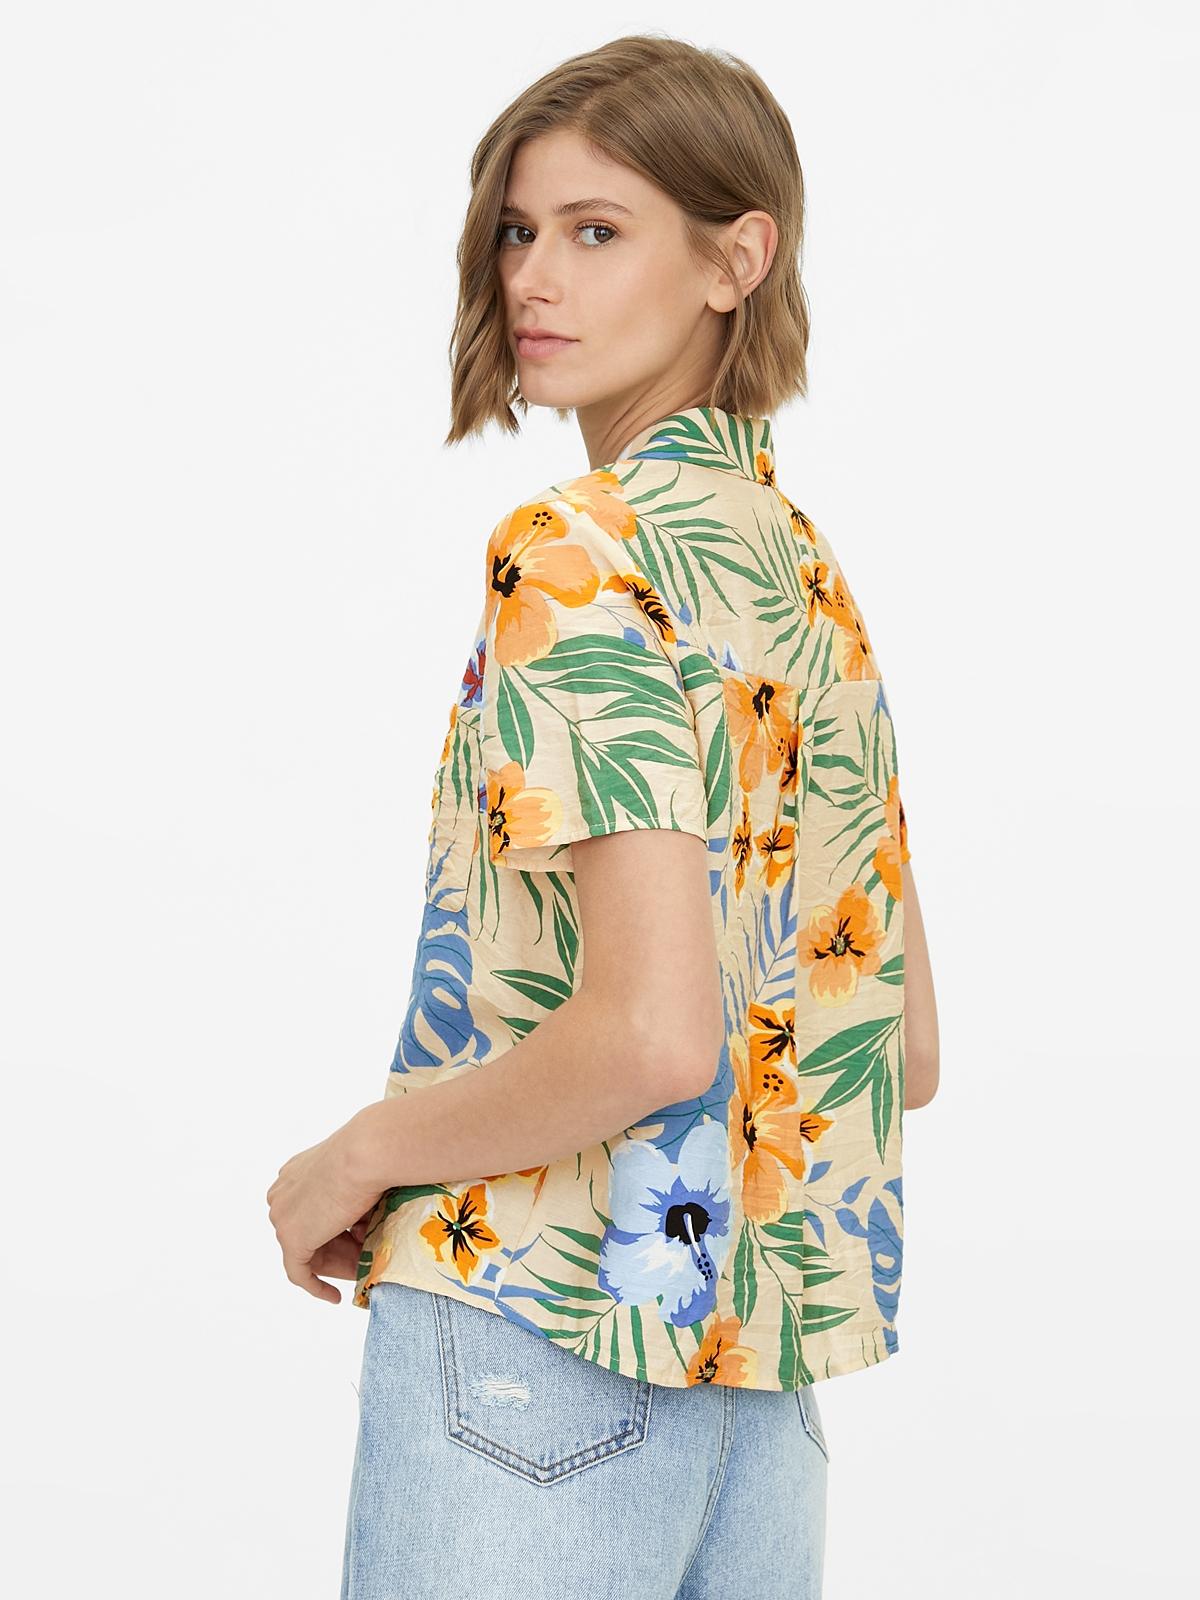 Tropical Print Buttoned Shirt Cream